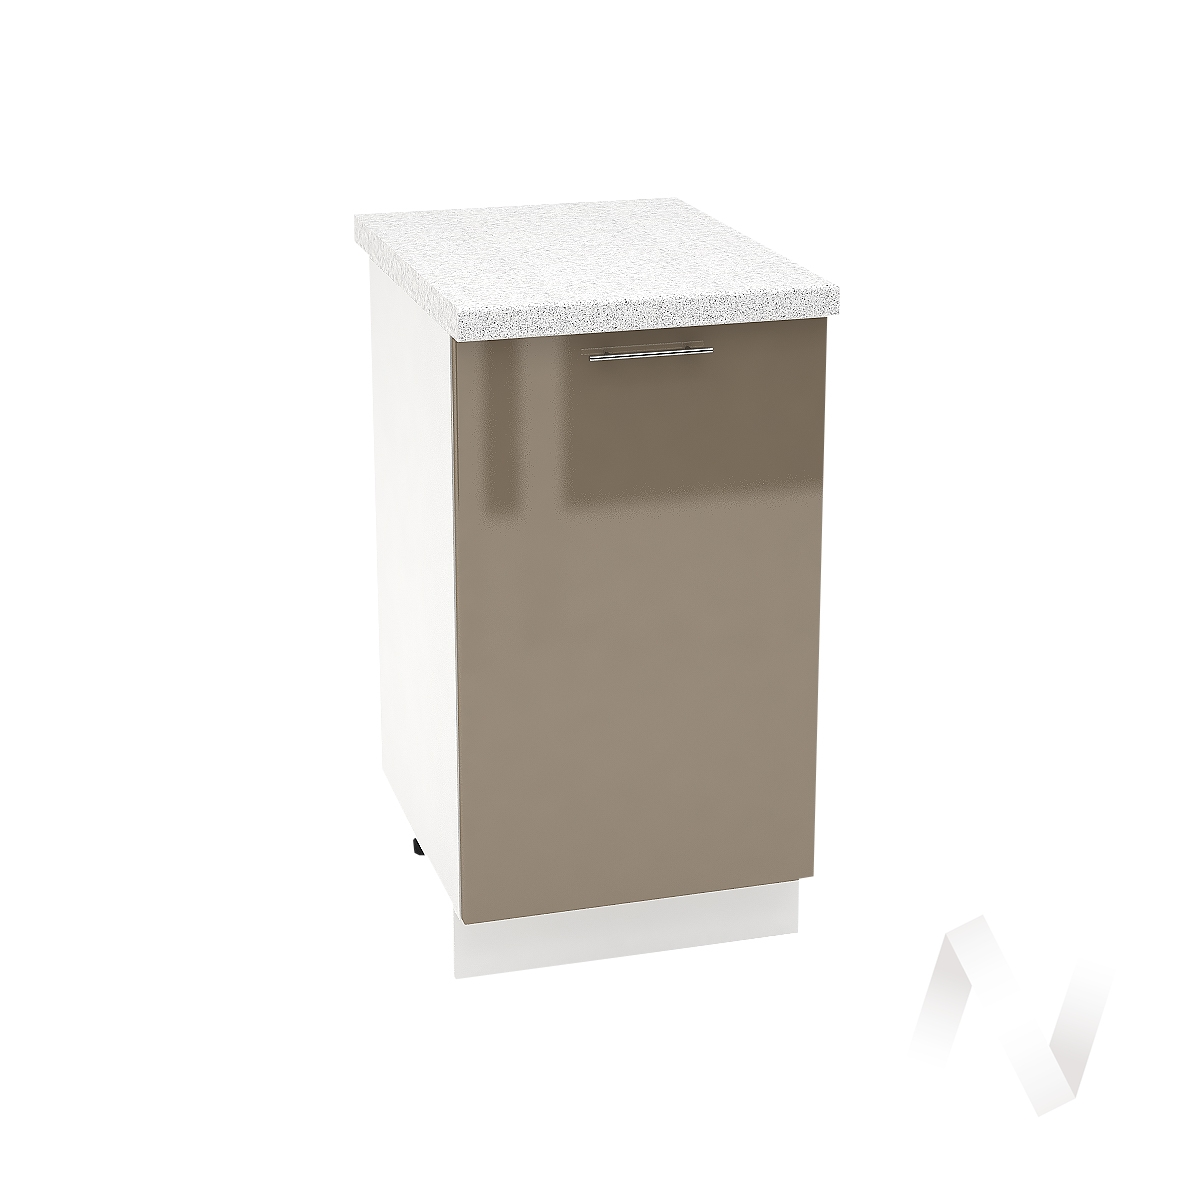 "Кухня ""Валерия-М"": Шкаф нижний 450, ШН 450 (Капучино глянец/корпус белый)"